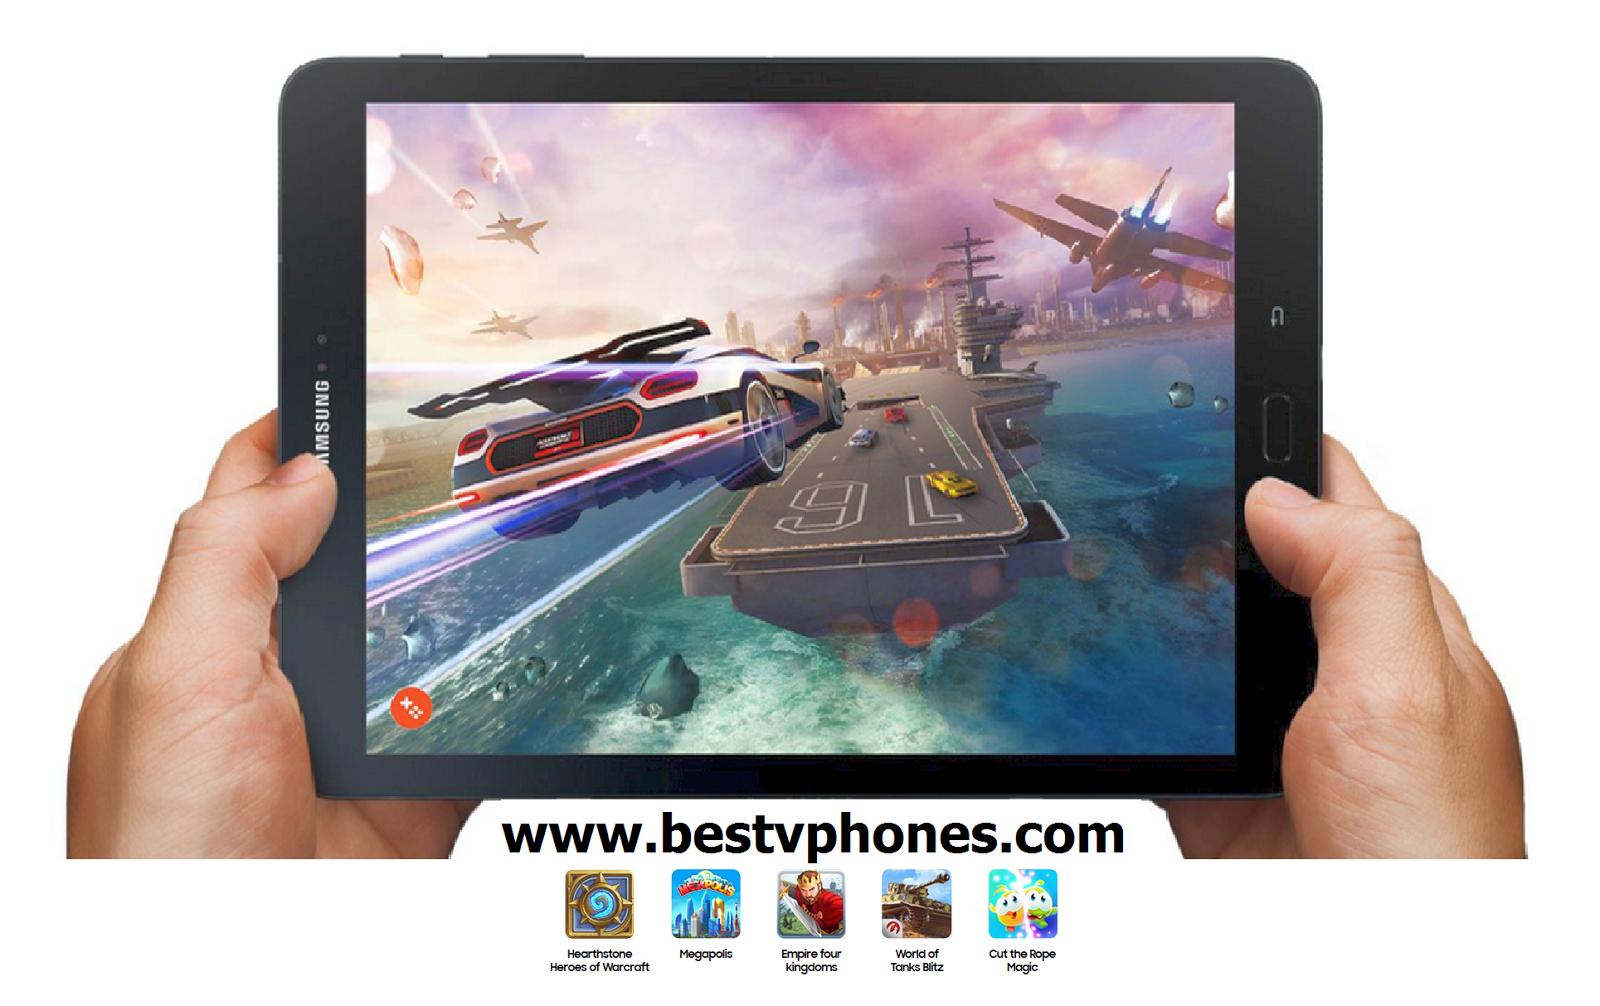 galaxy tab s3 user guide tutorial tips and tricks jazminmedrano rh jazminmedrano com Manual for Samsung Galaxy samsung galaxy s3 tablet 8 inch review